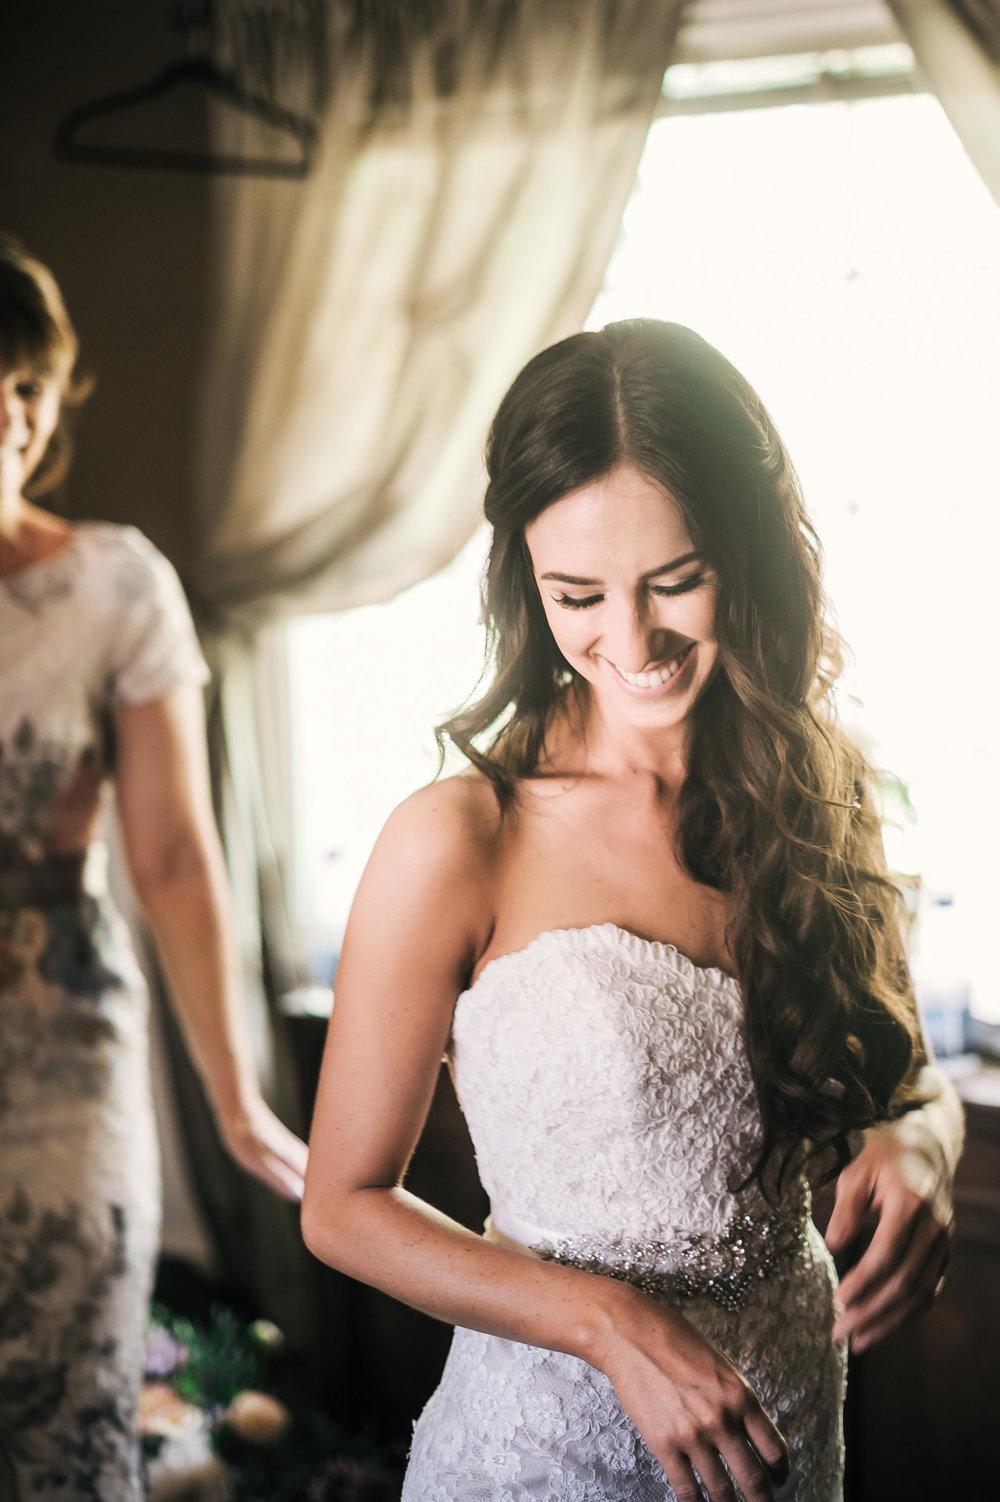 Smiling bride in the bridal suite at the Quail Haven Farm in Vista, California.